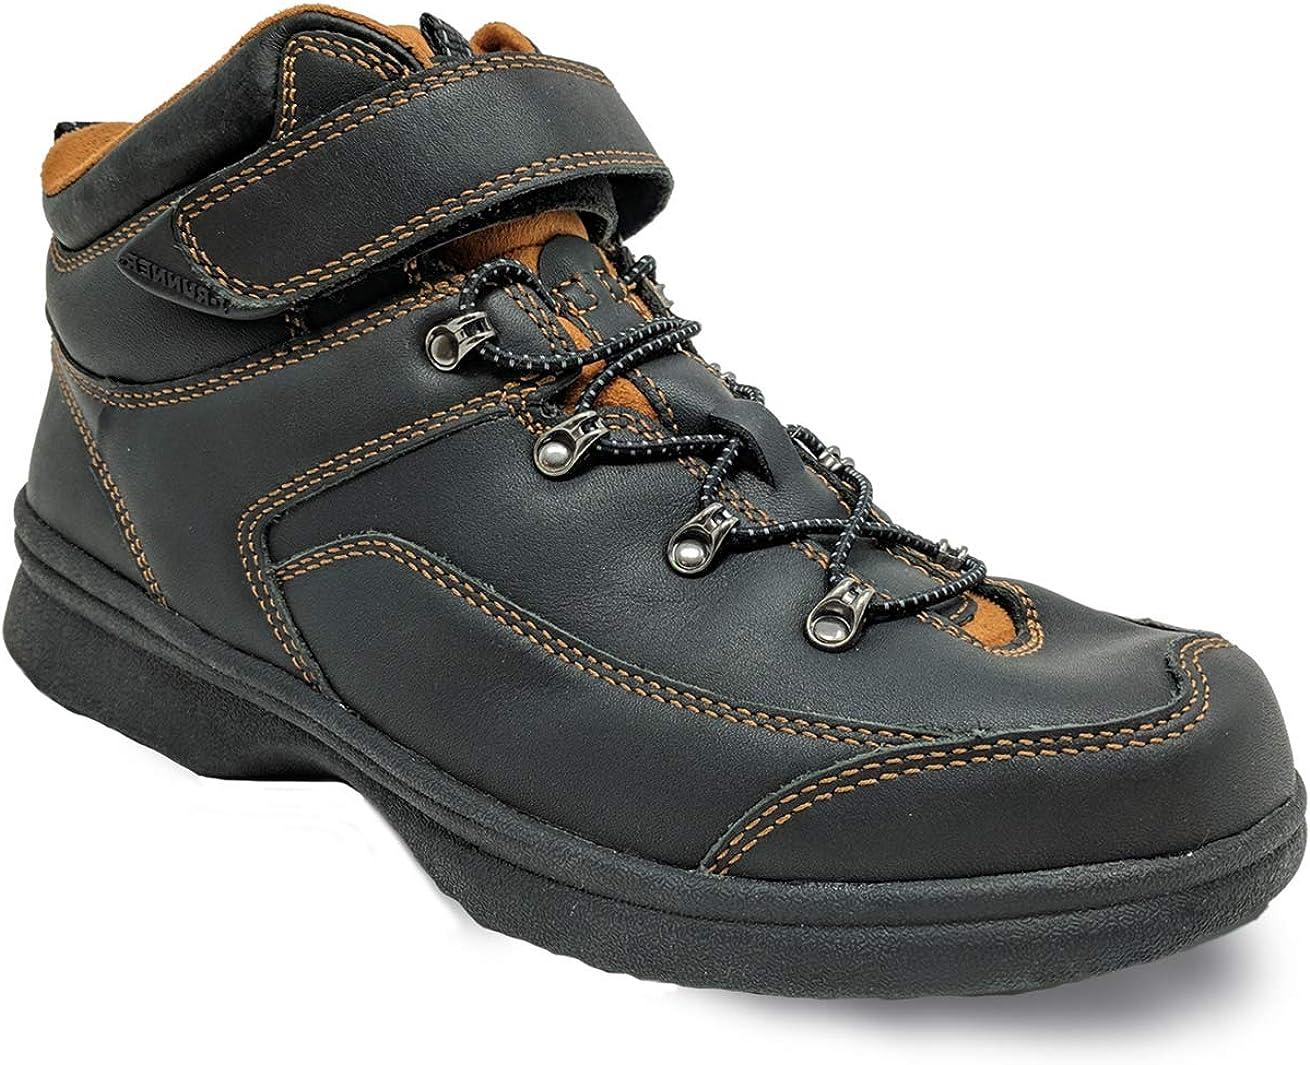 I-Runner Pioneer Womens Hiking Boot 6E